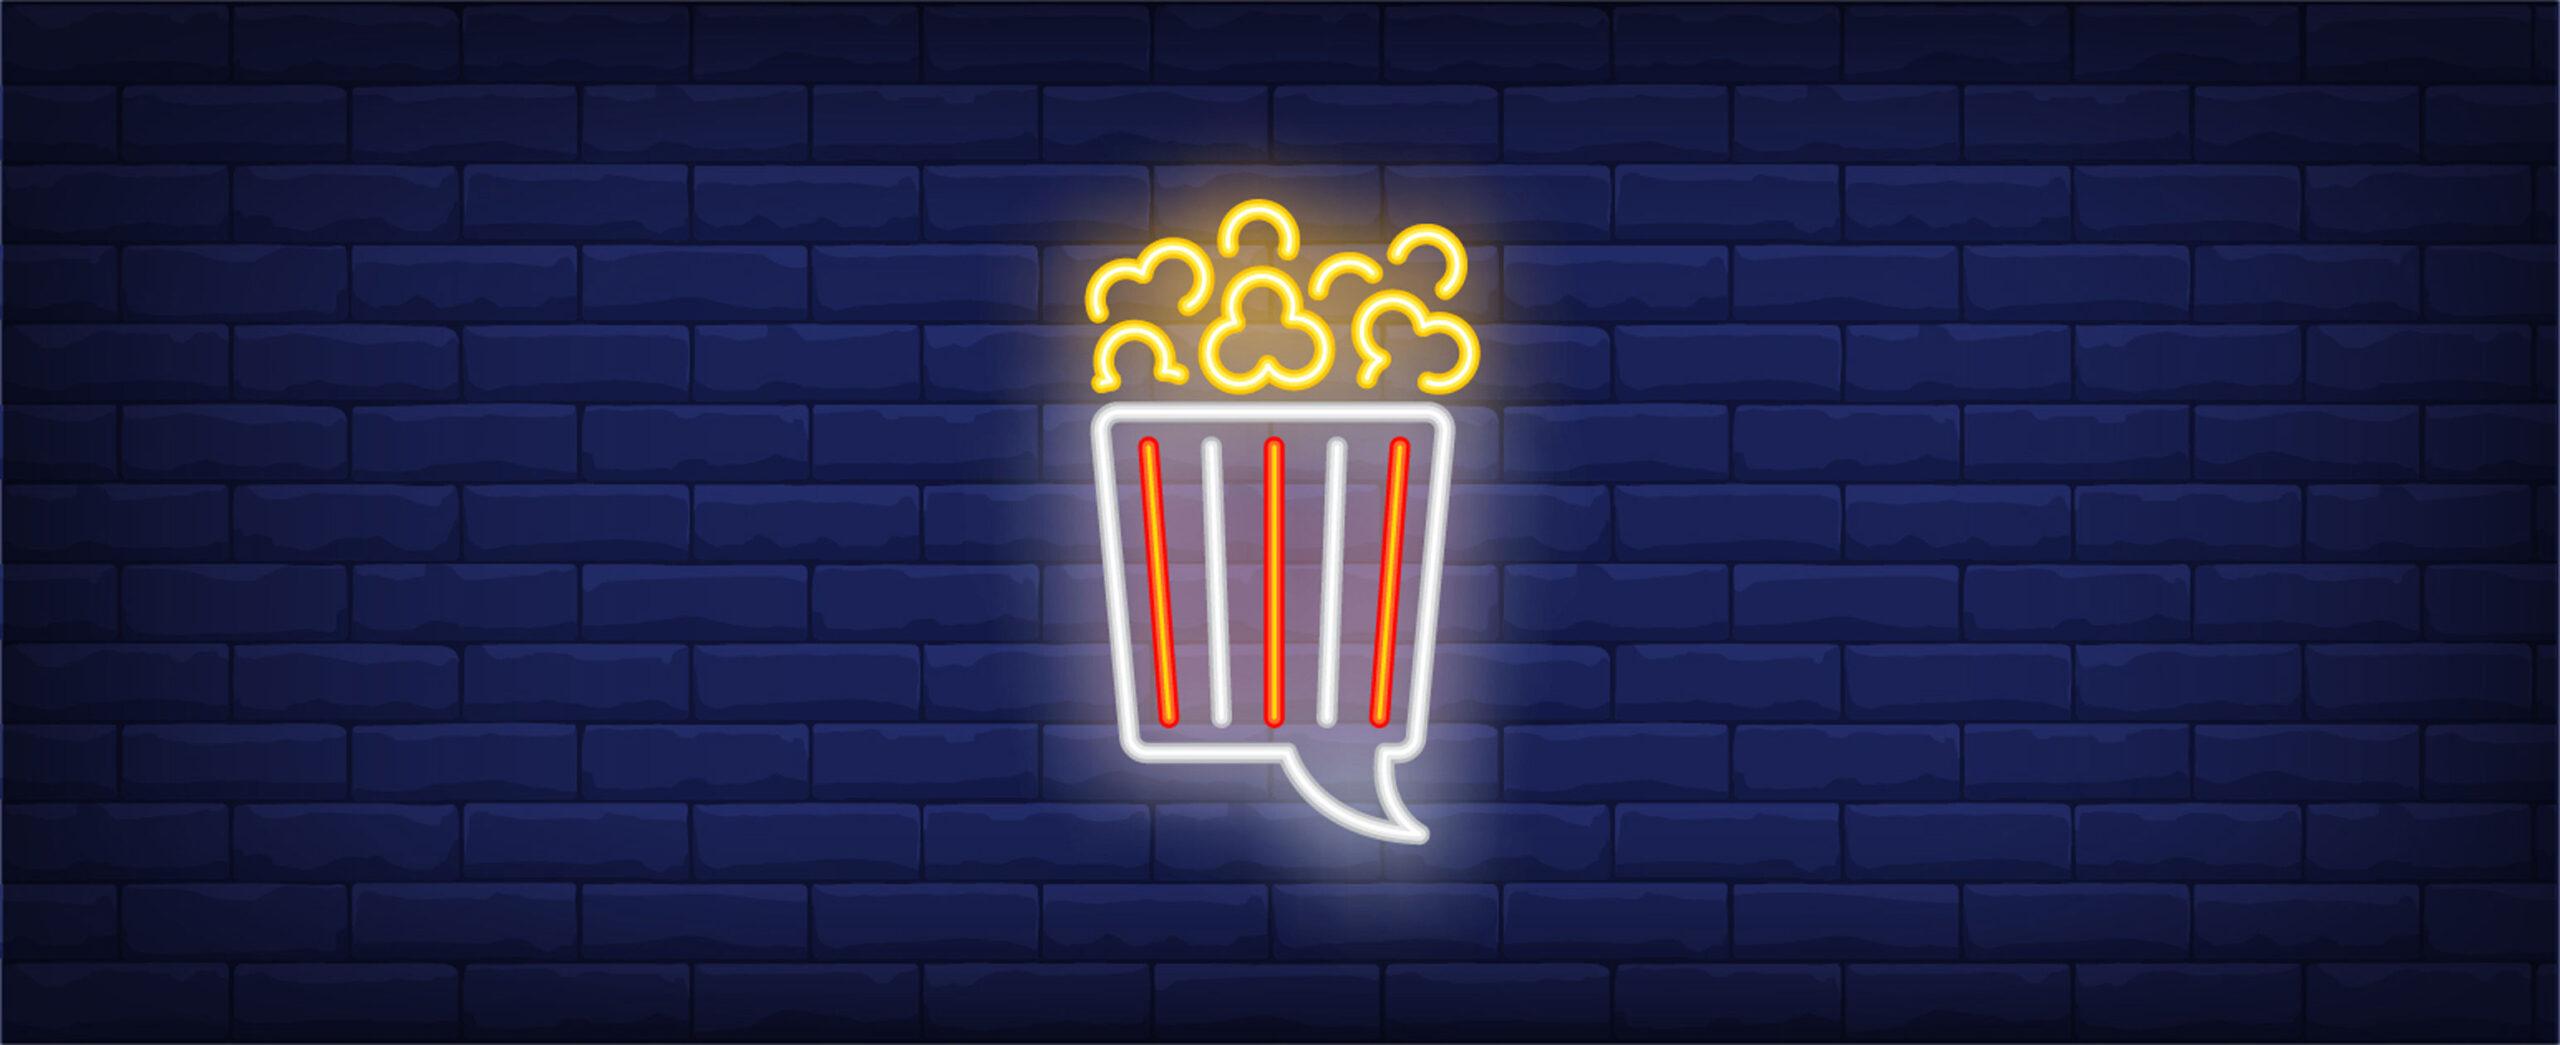 Popcorn Illustration Leuchtschrift